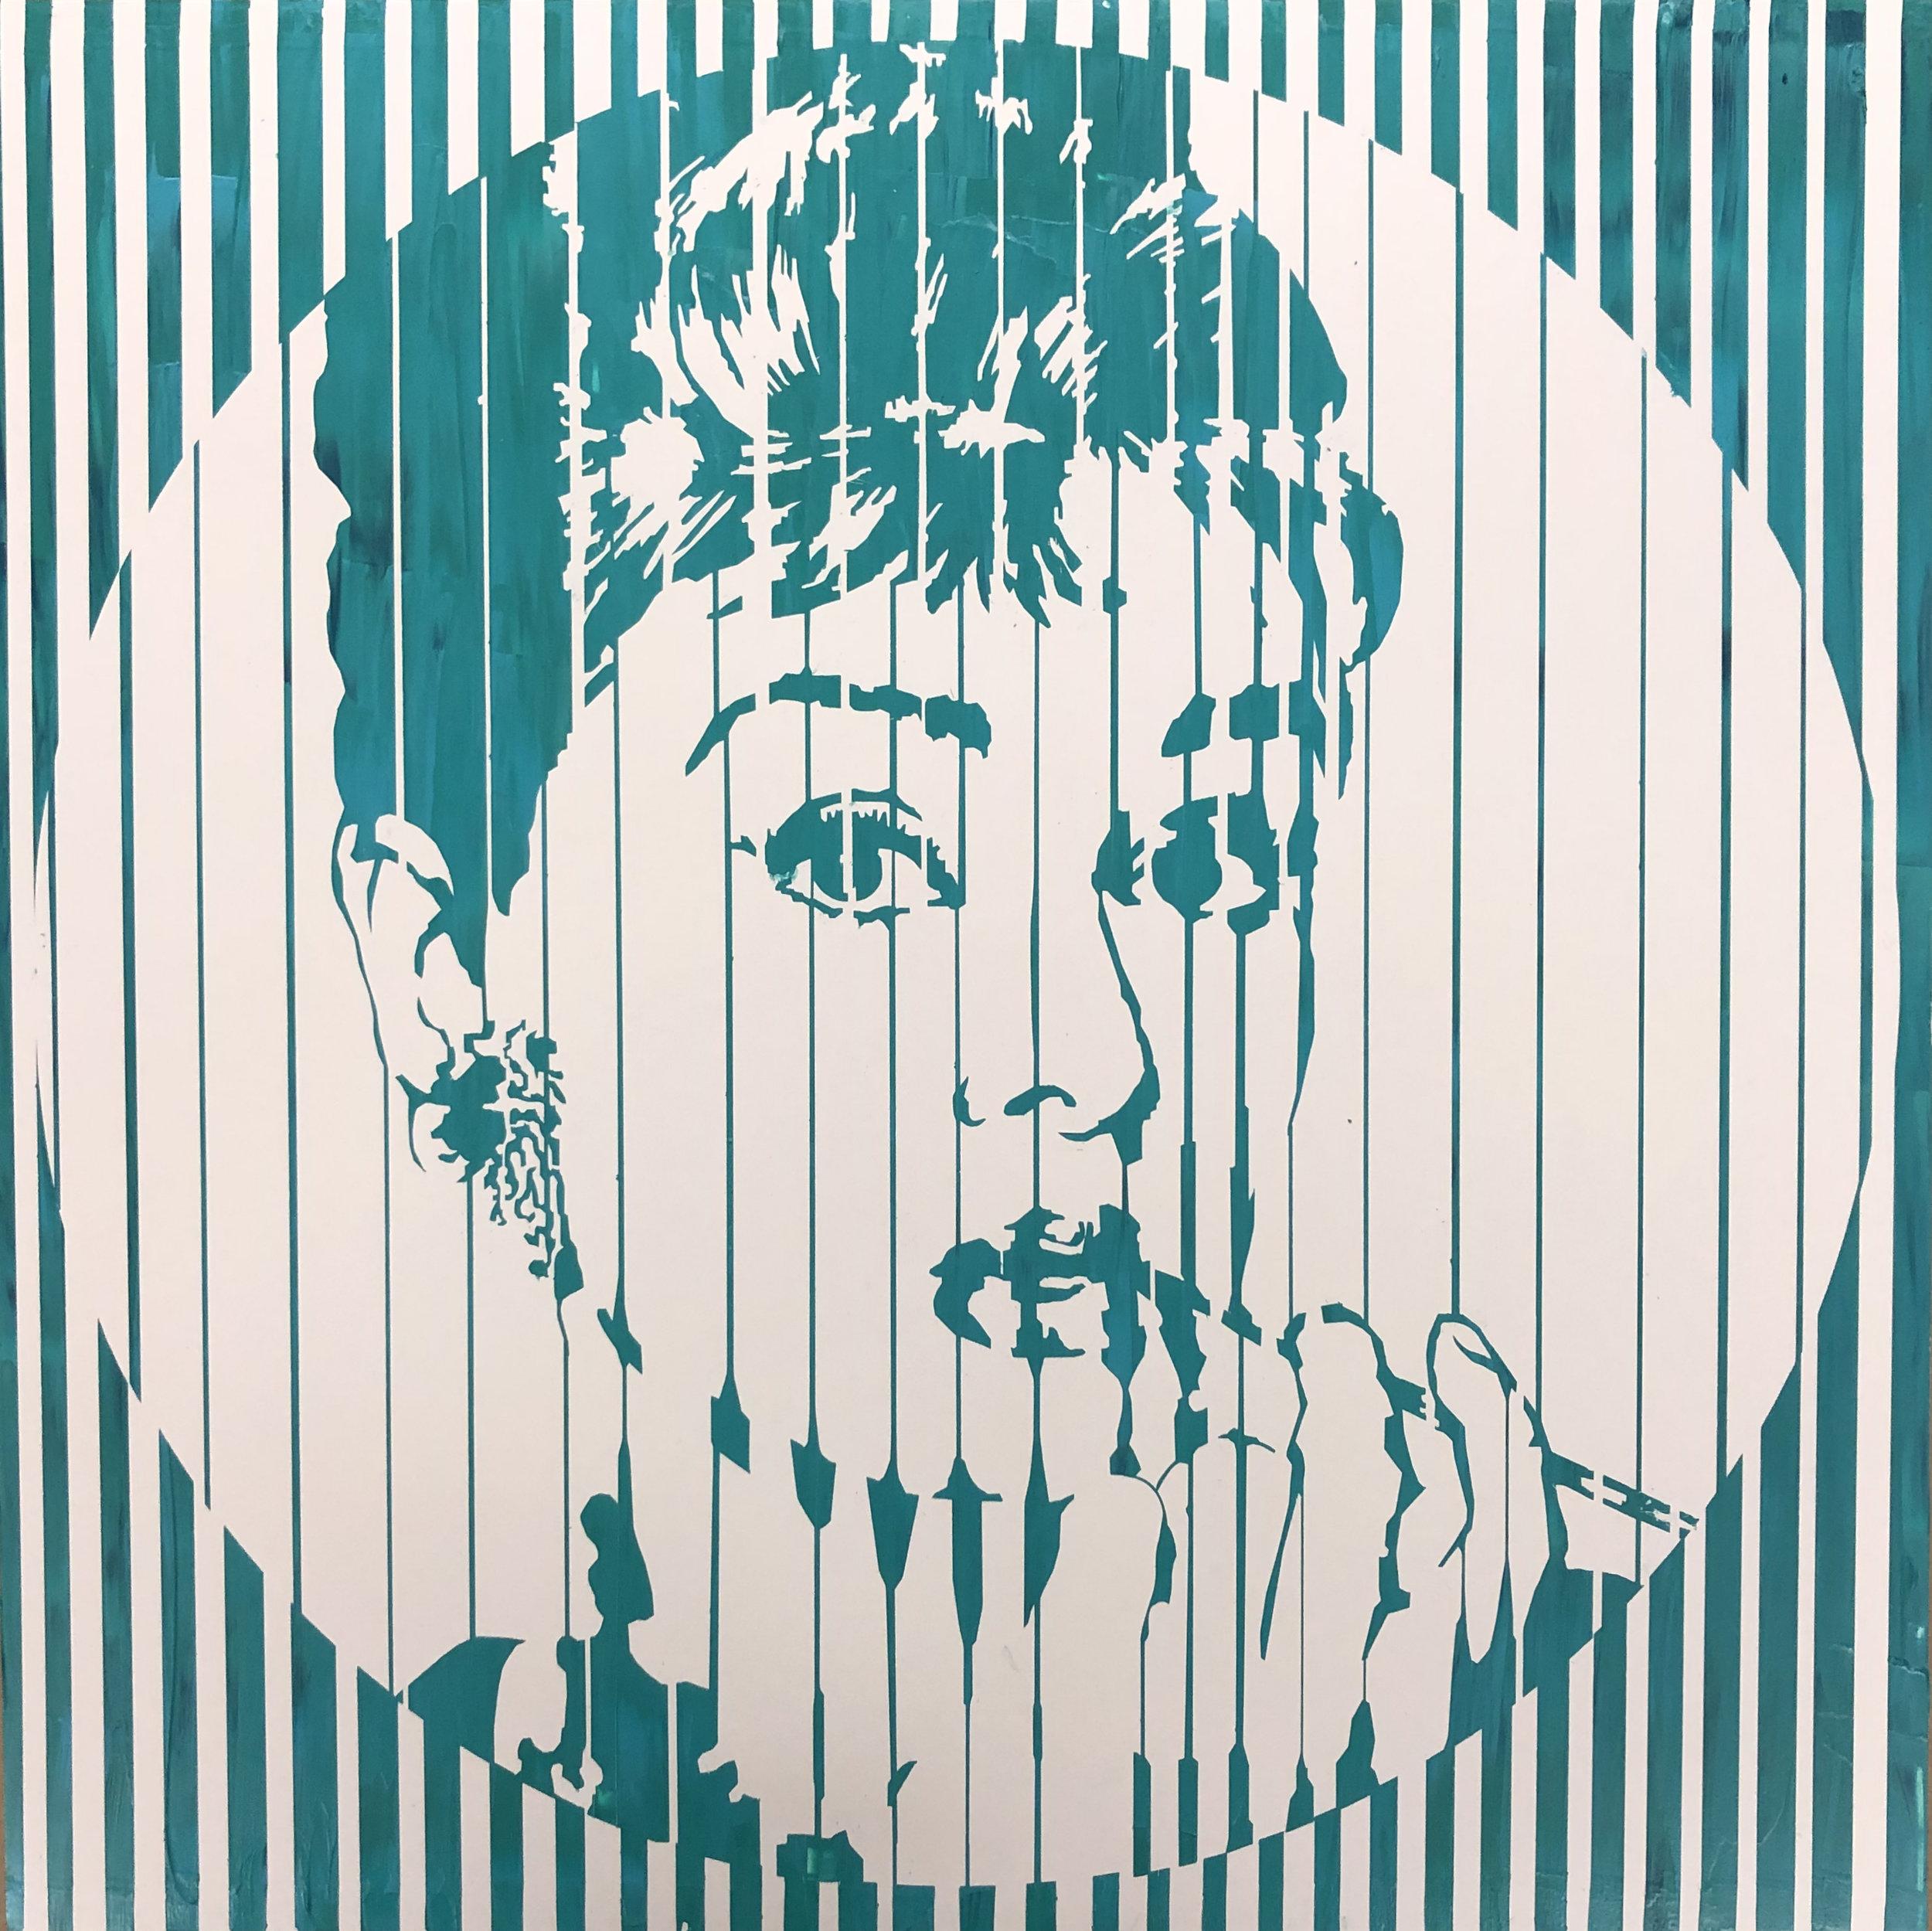 Sean Christopher Ward - Audrey IX - Acrylic on Wood Panel - 16x16x1.5 - 2018 - 500.jpg